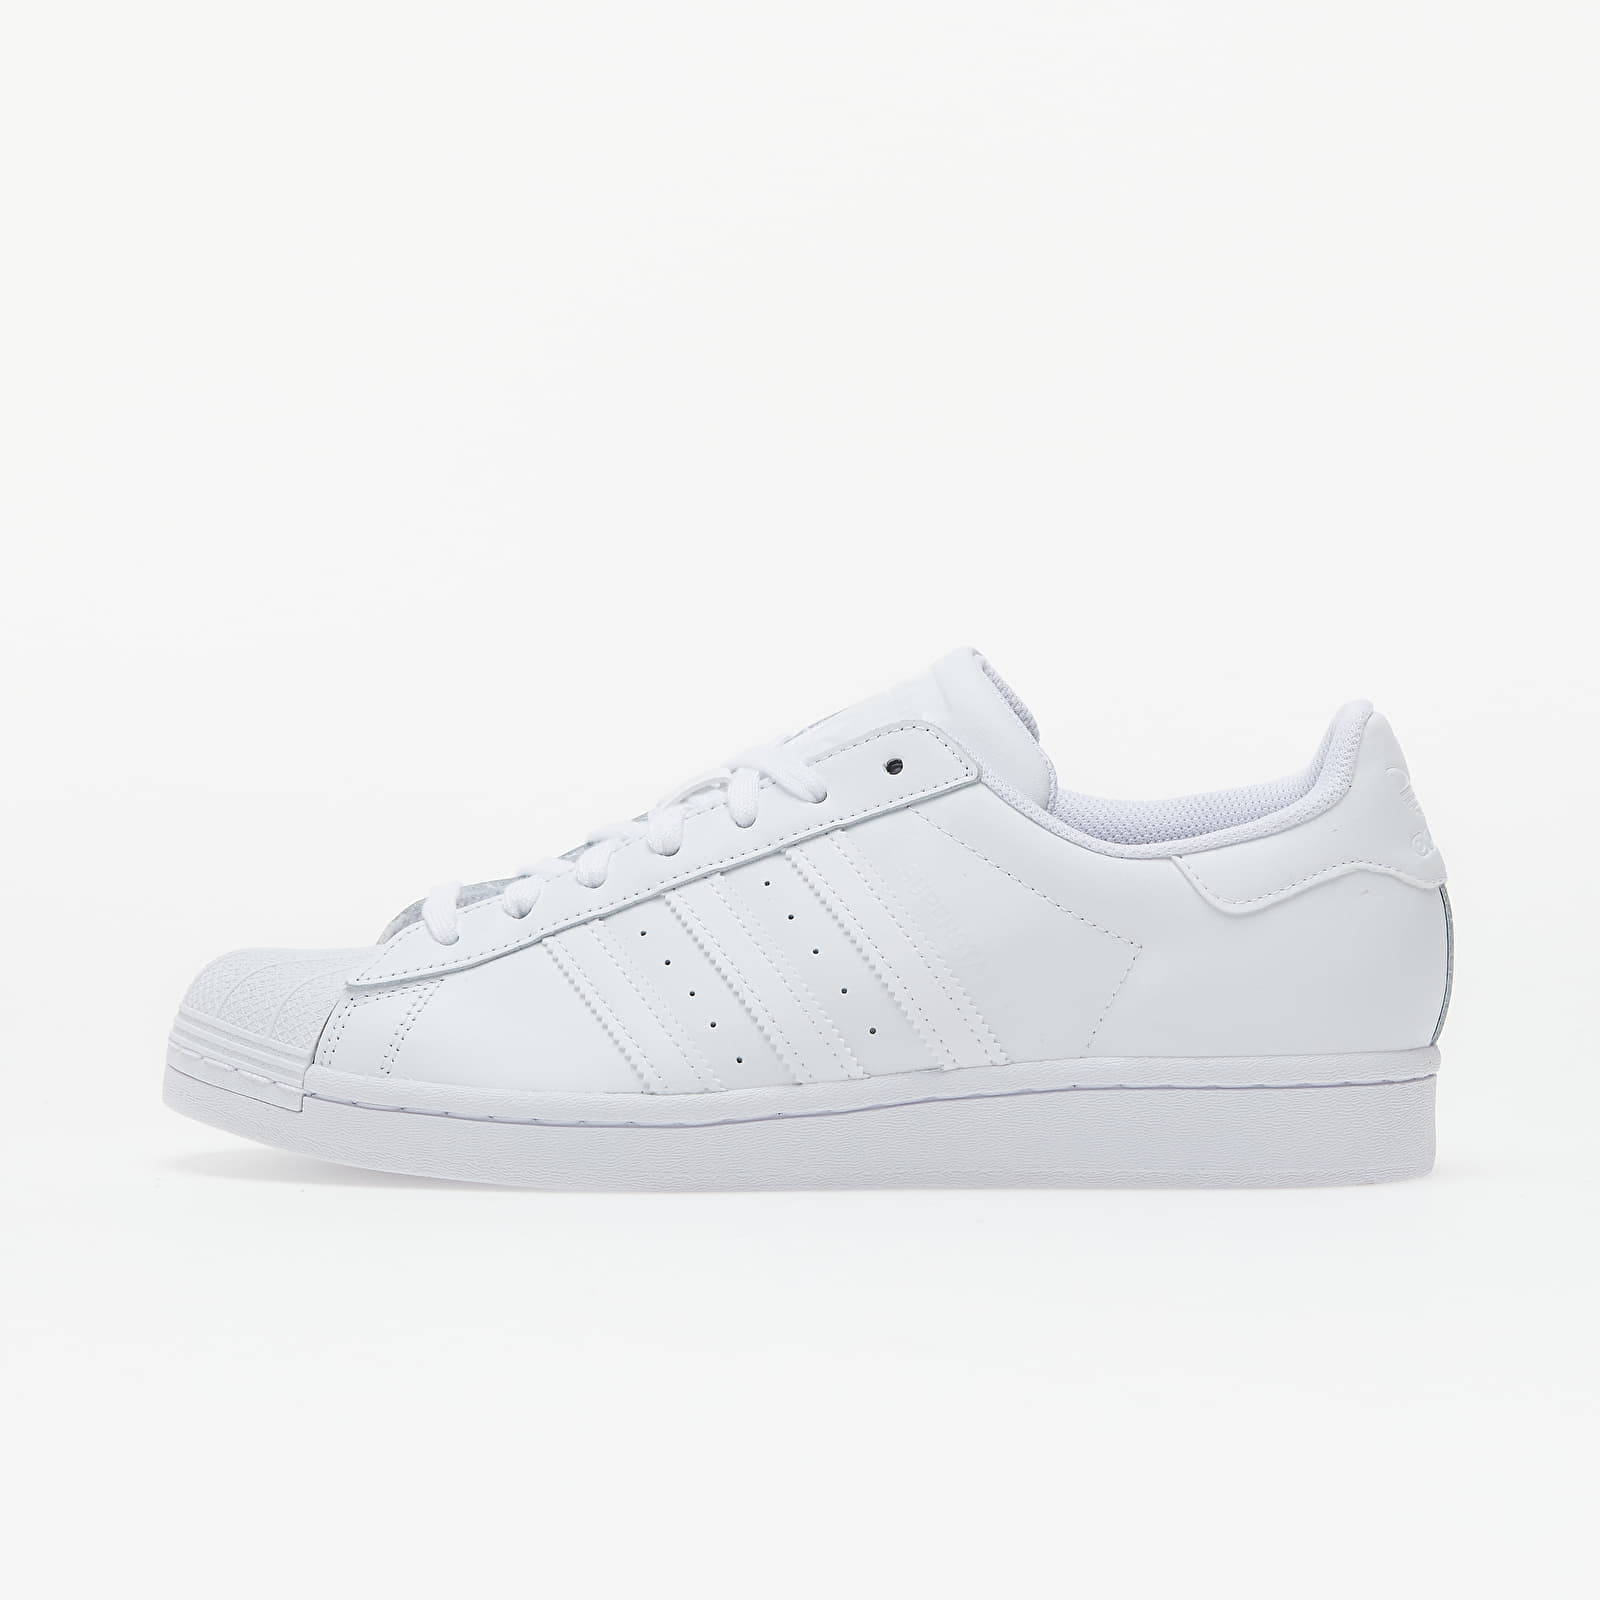 adidas Superstar Ftw White/ Ftw White/ Ftw White EUR 36 2/3